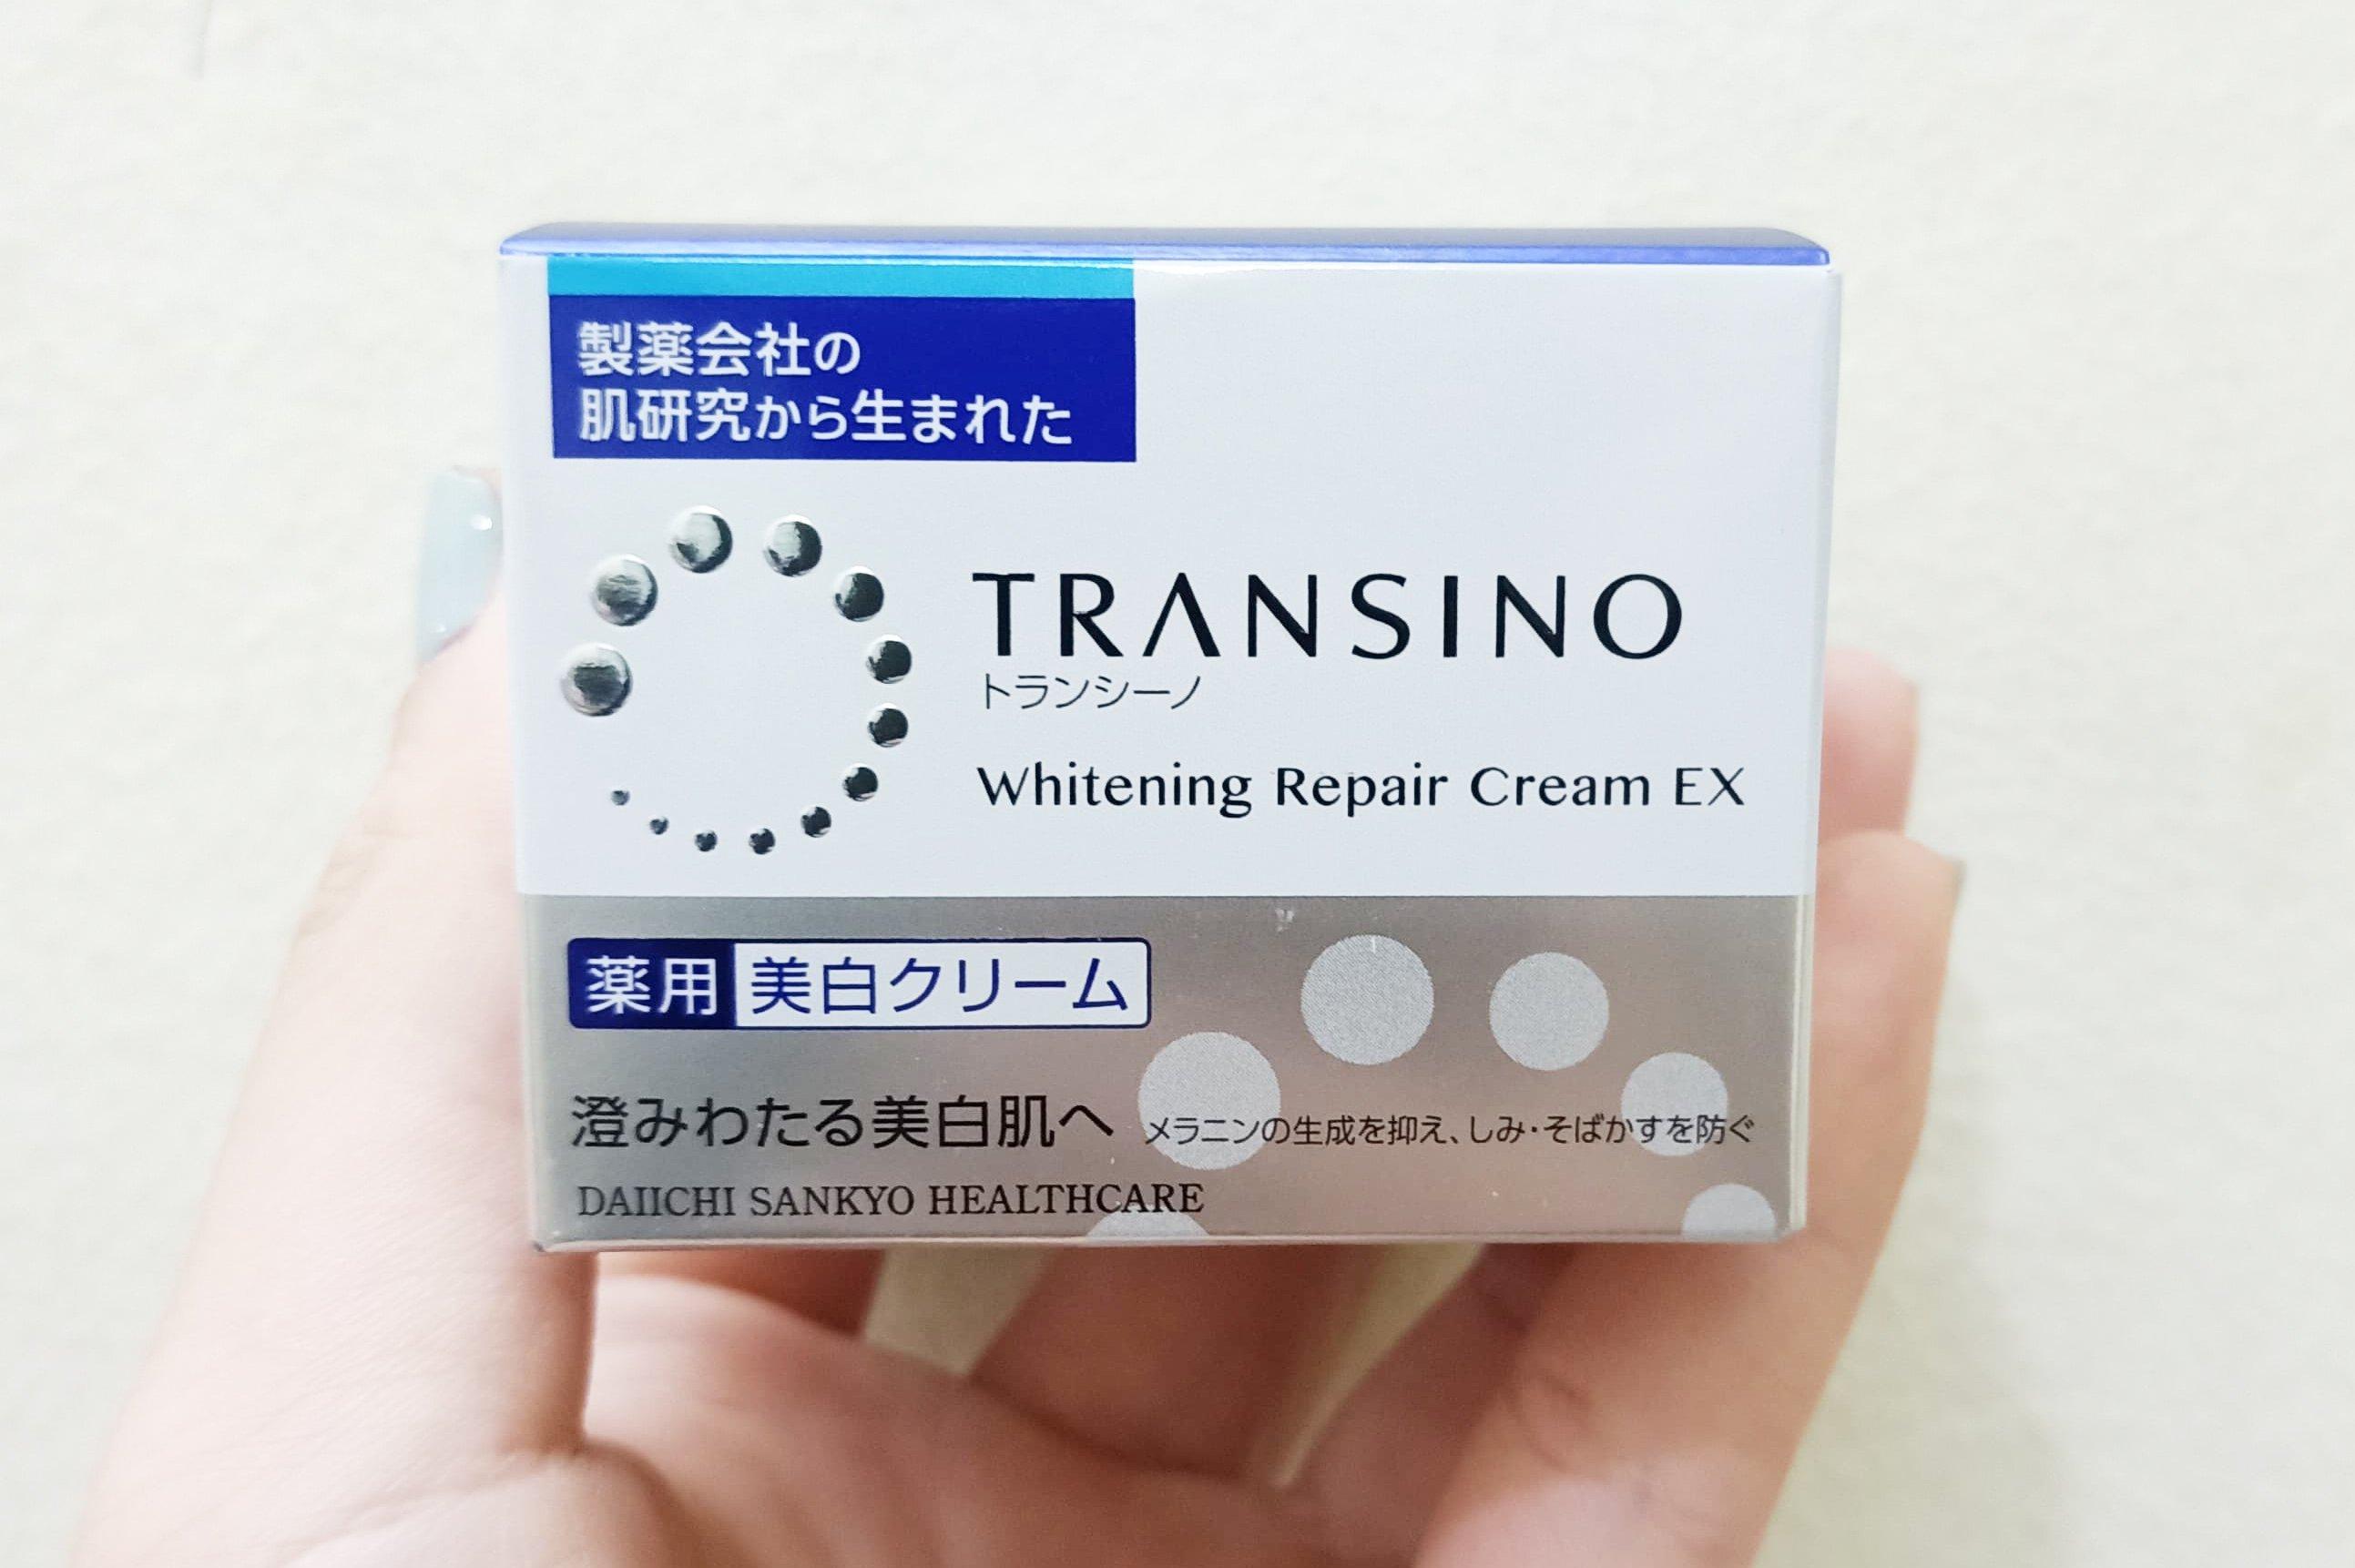 Kem dưỡng trắng Transino Whitening Repair Cream mẫu mới